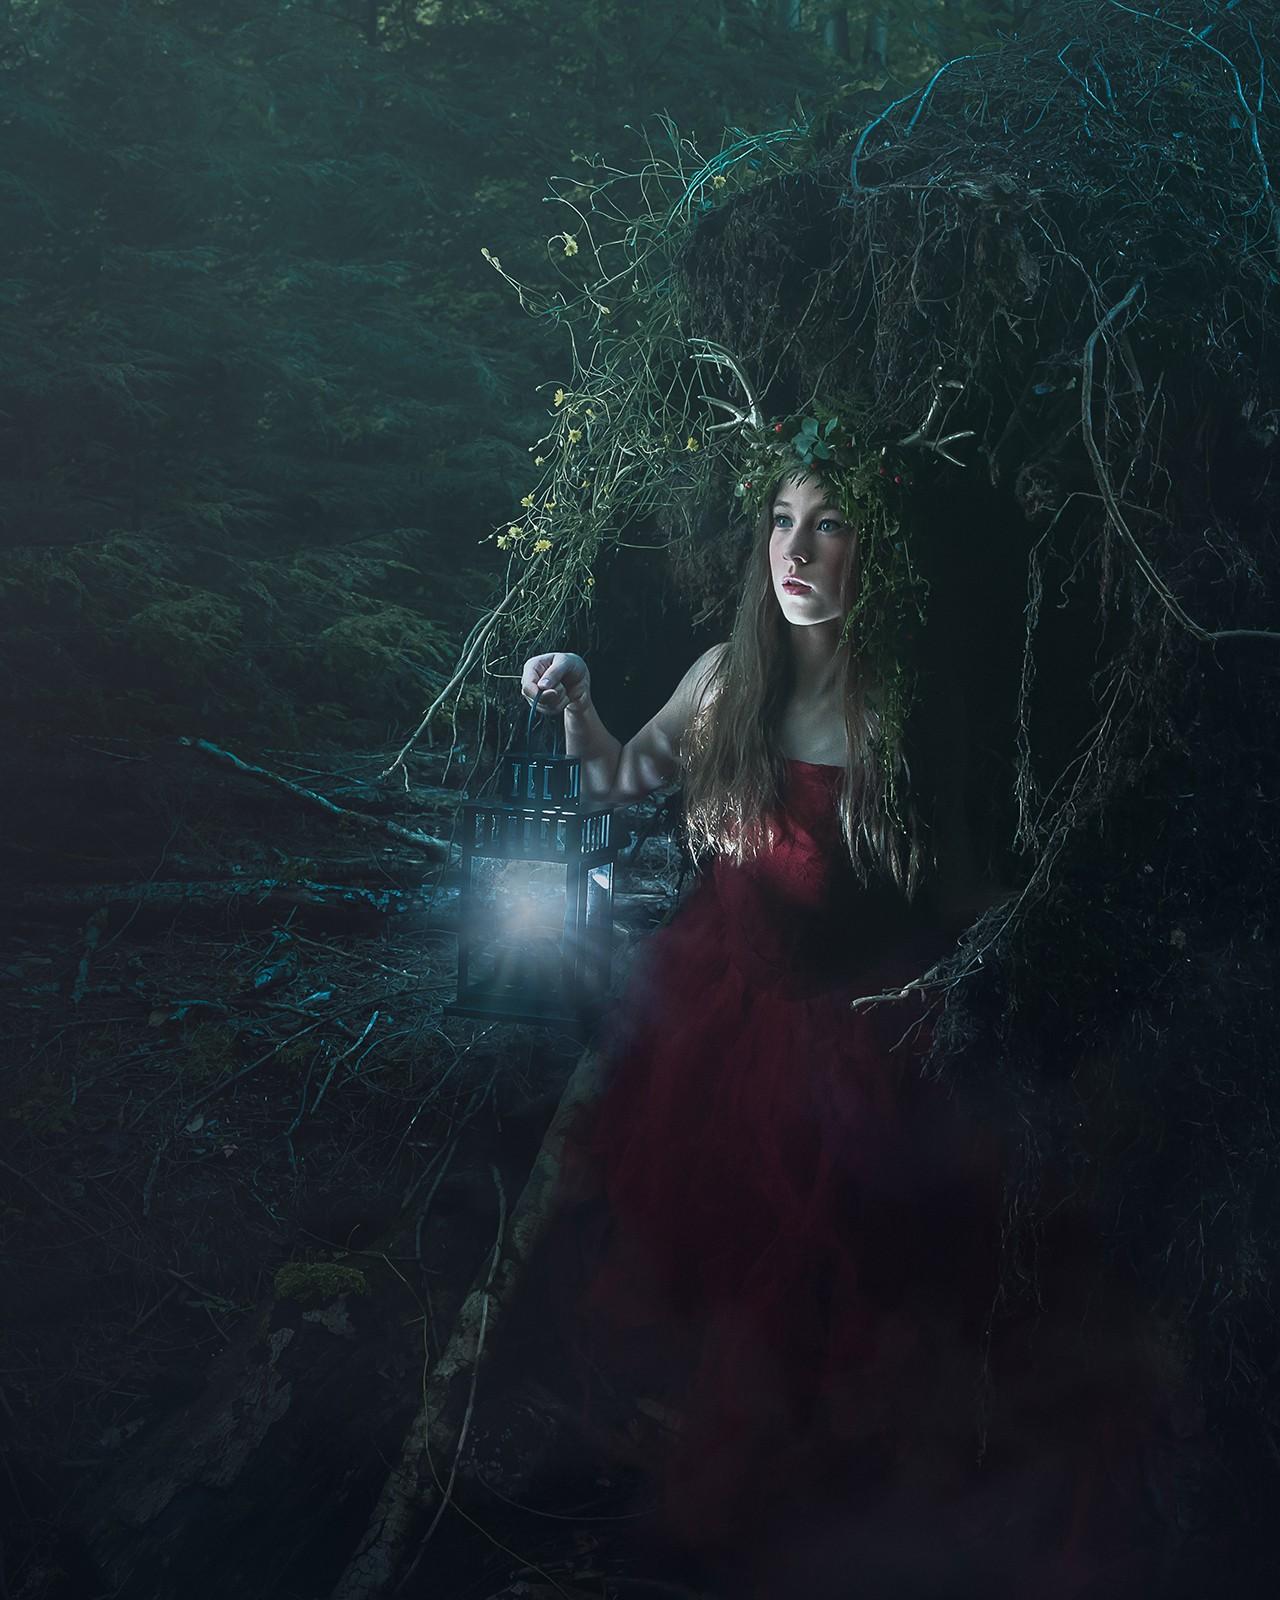 alana-lee-photography-girl with antlers.jpg